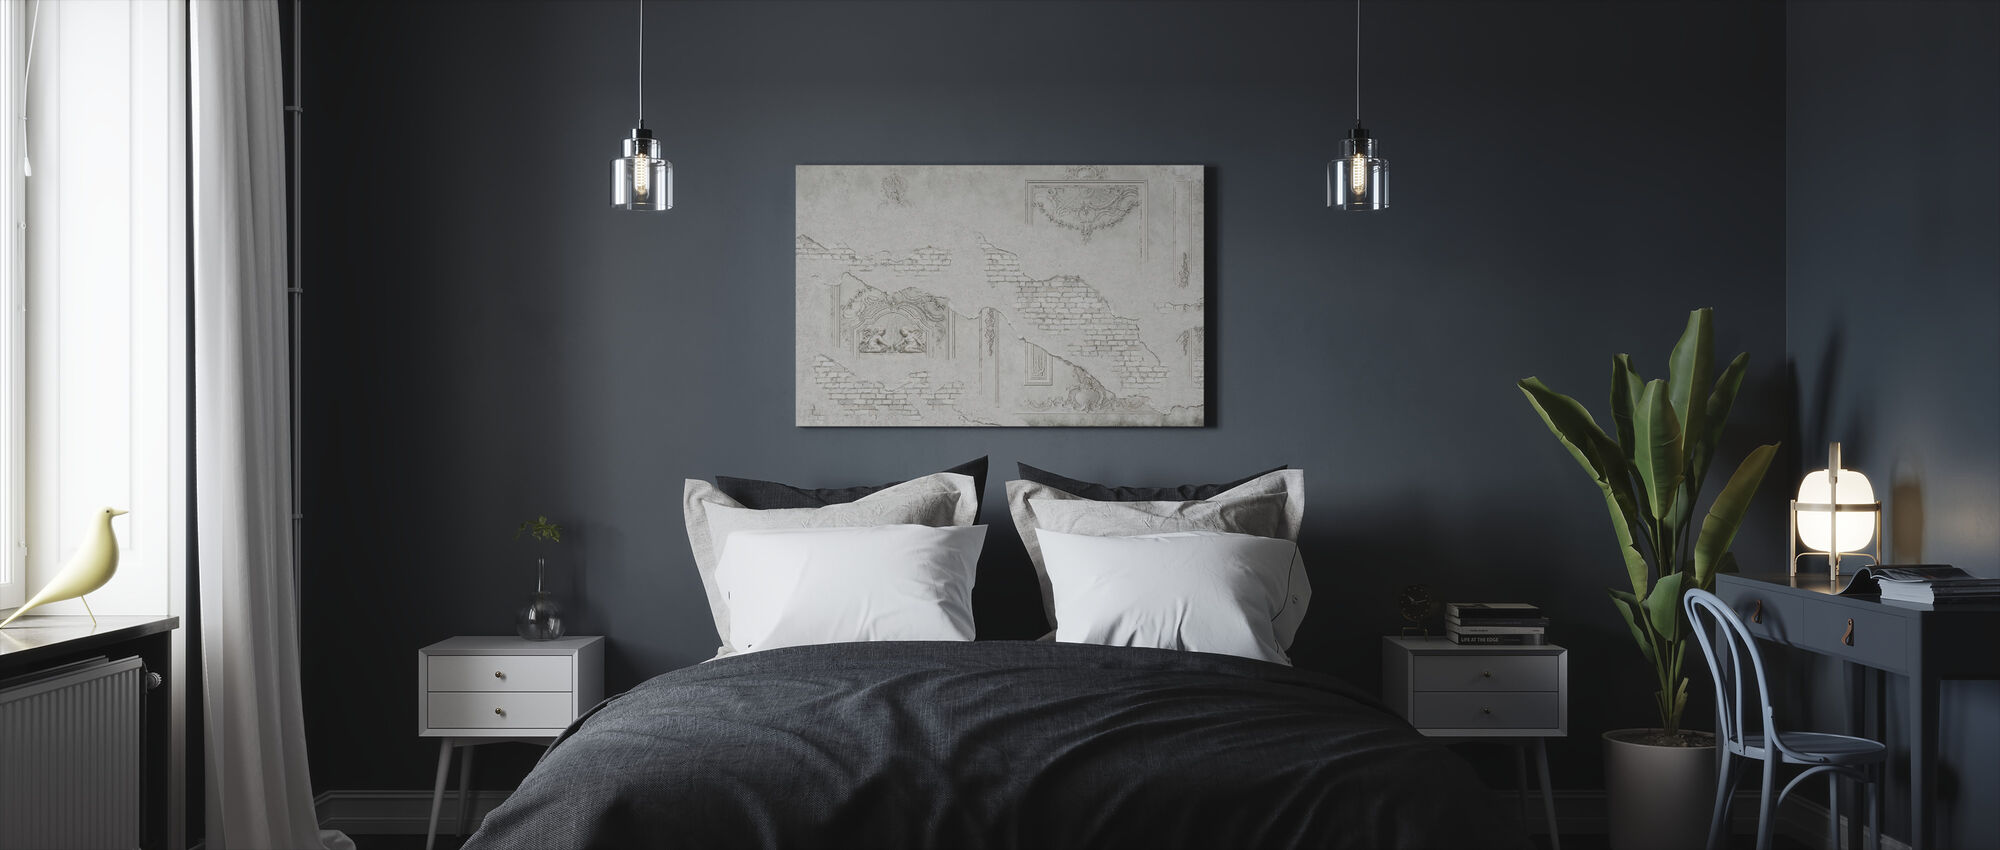 Cracked Plaster Ornament Brick Wall - Canvas print - Bedroom